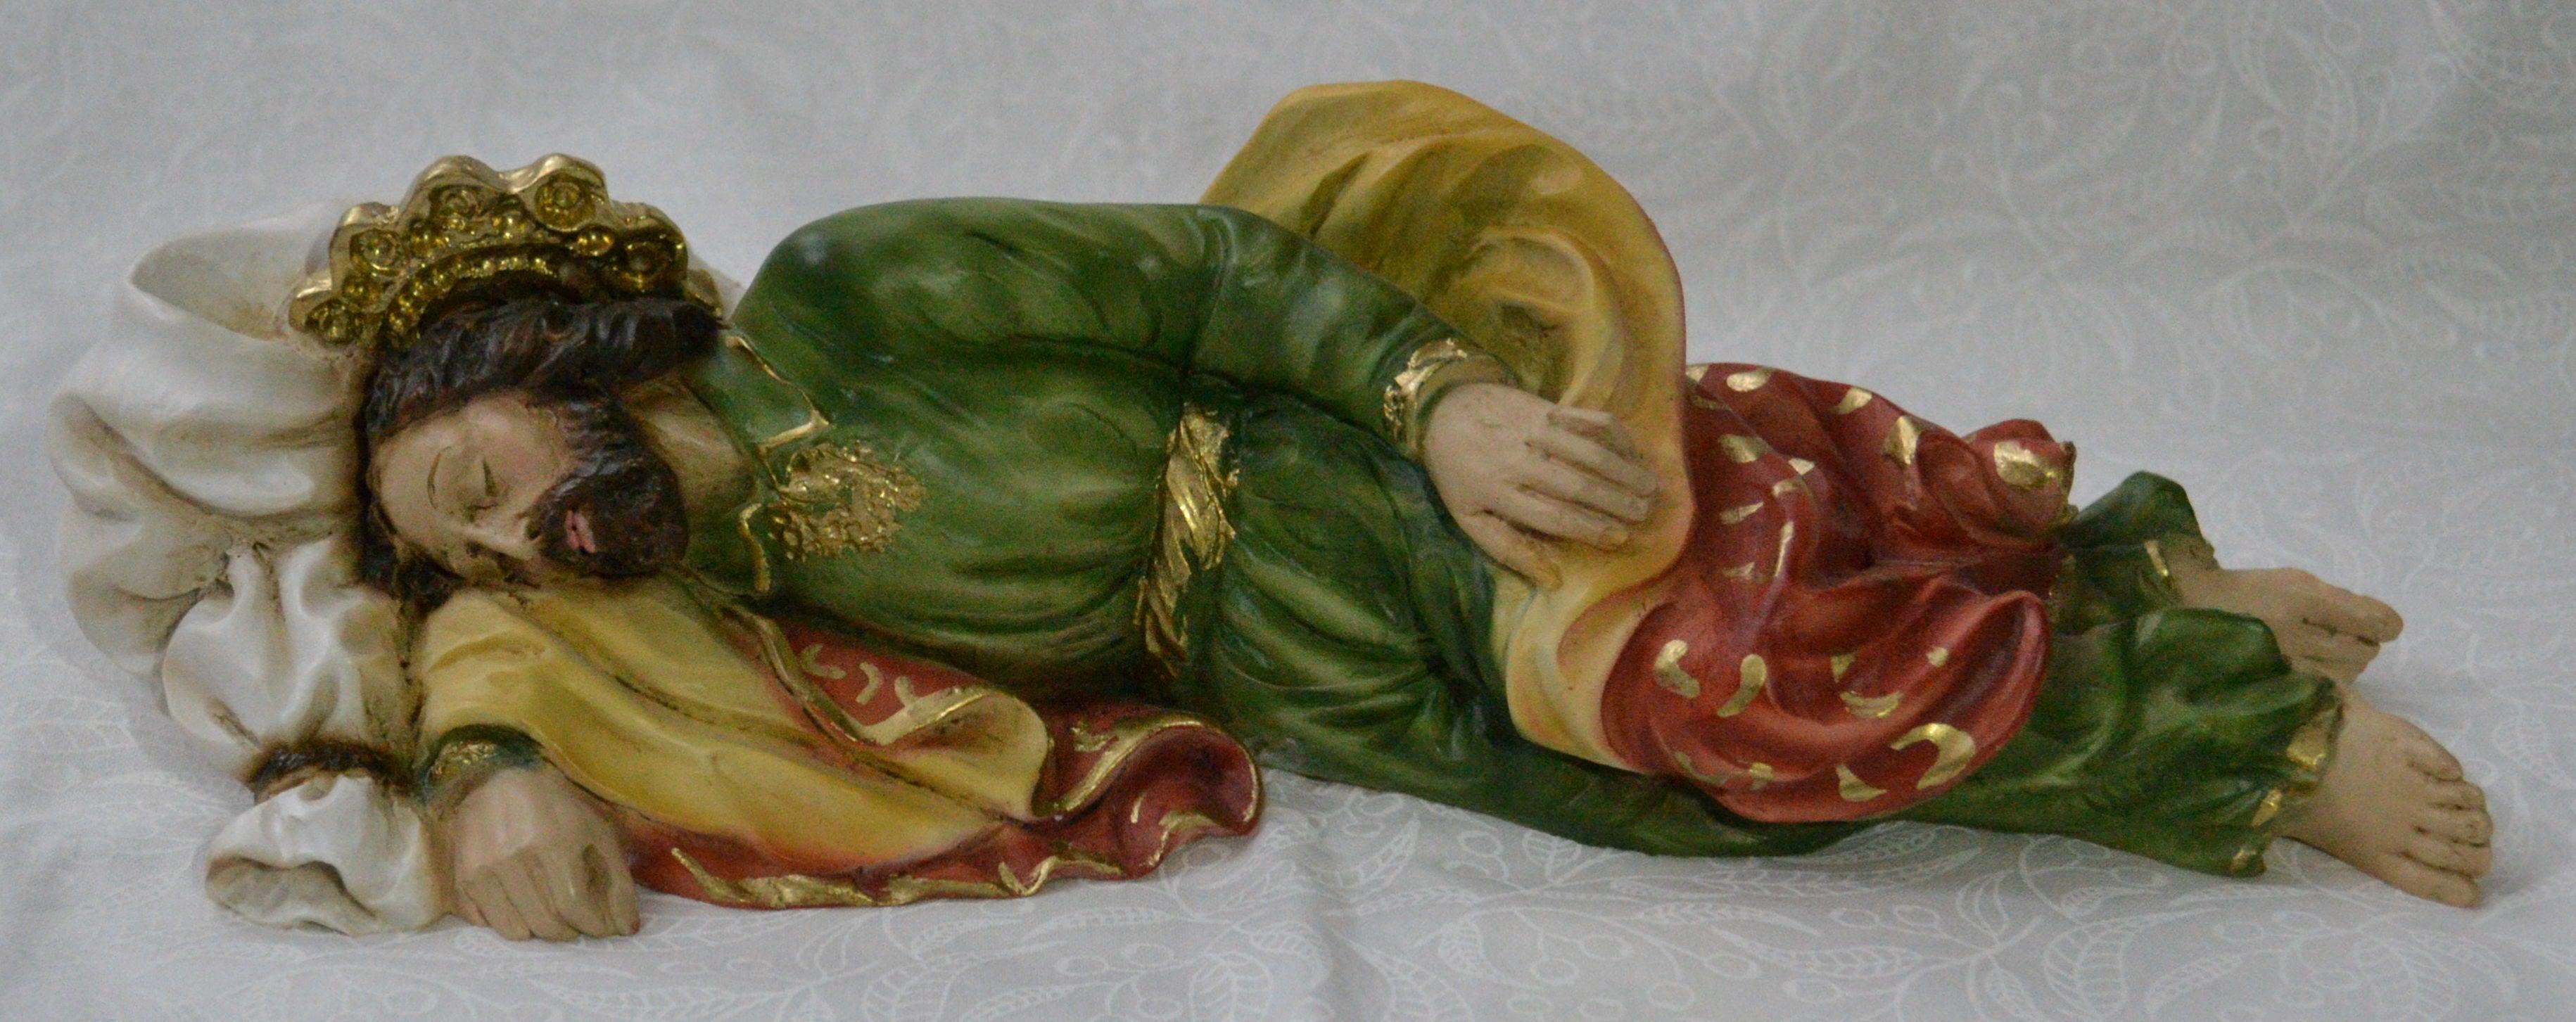 Saint Joseph 26cm Sleeping Statue, Heavy Resin Construction, Made in Italy